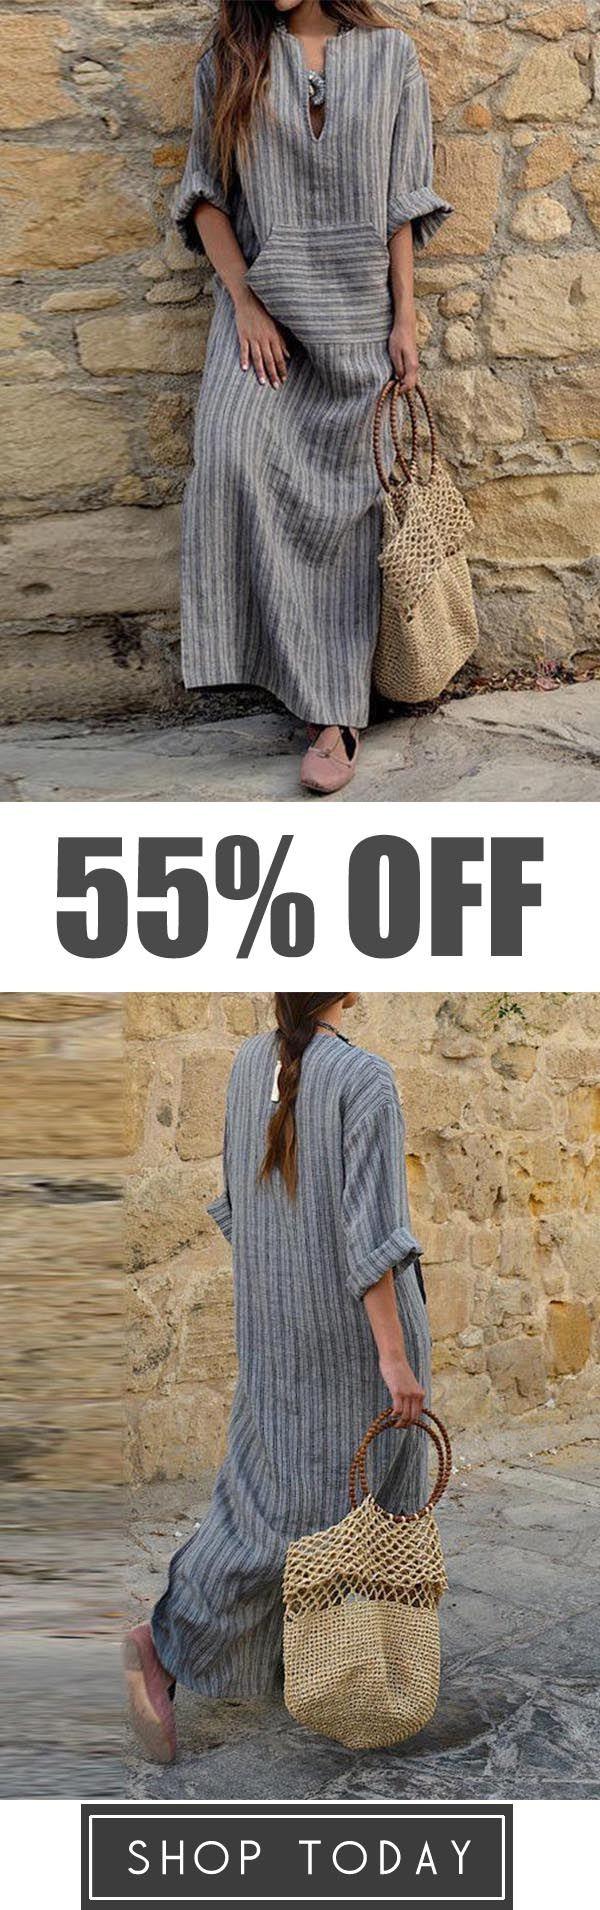 8dcfe70d9f3 Casual Loose Maxi Dresses Cotton Linen Striped Long Sleeve Dress ...